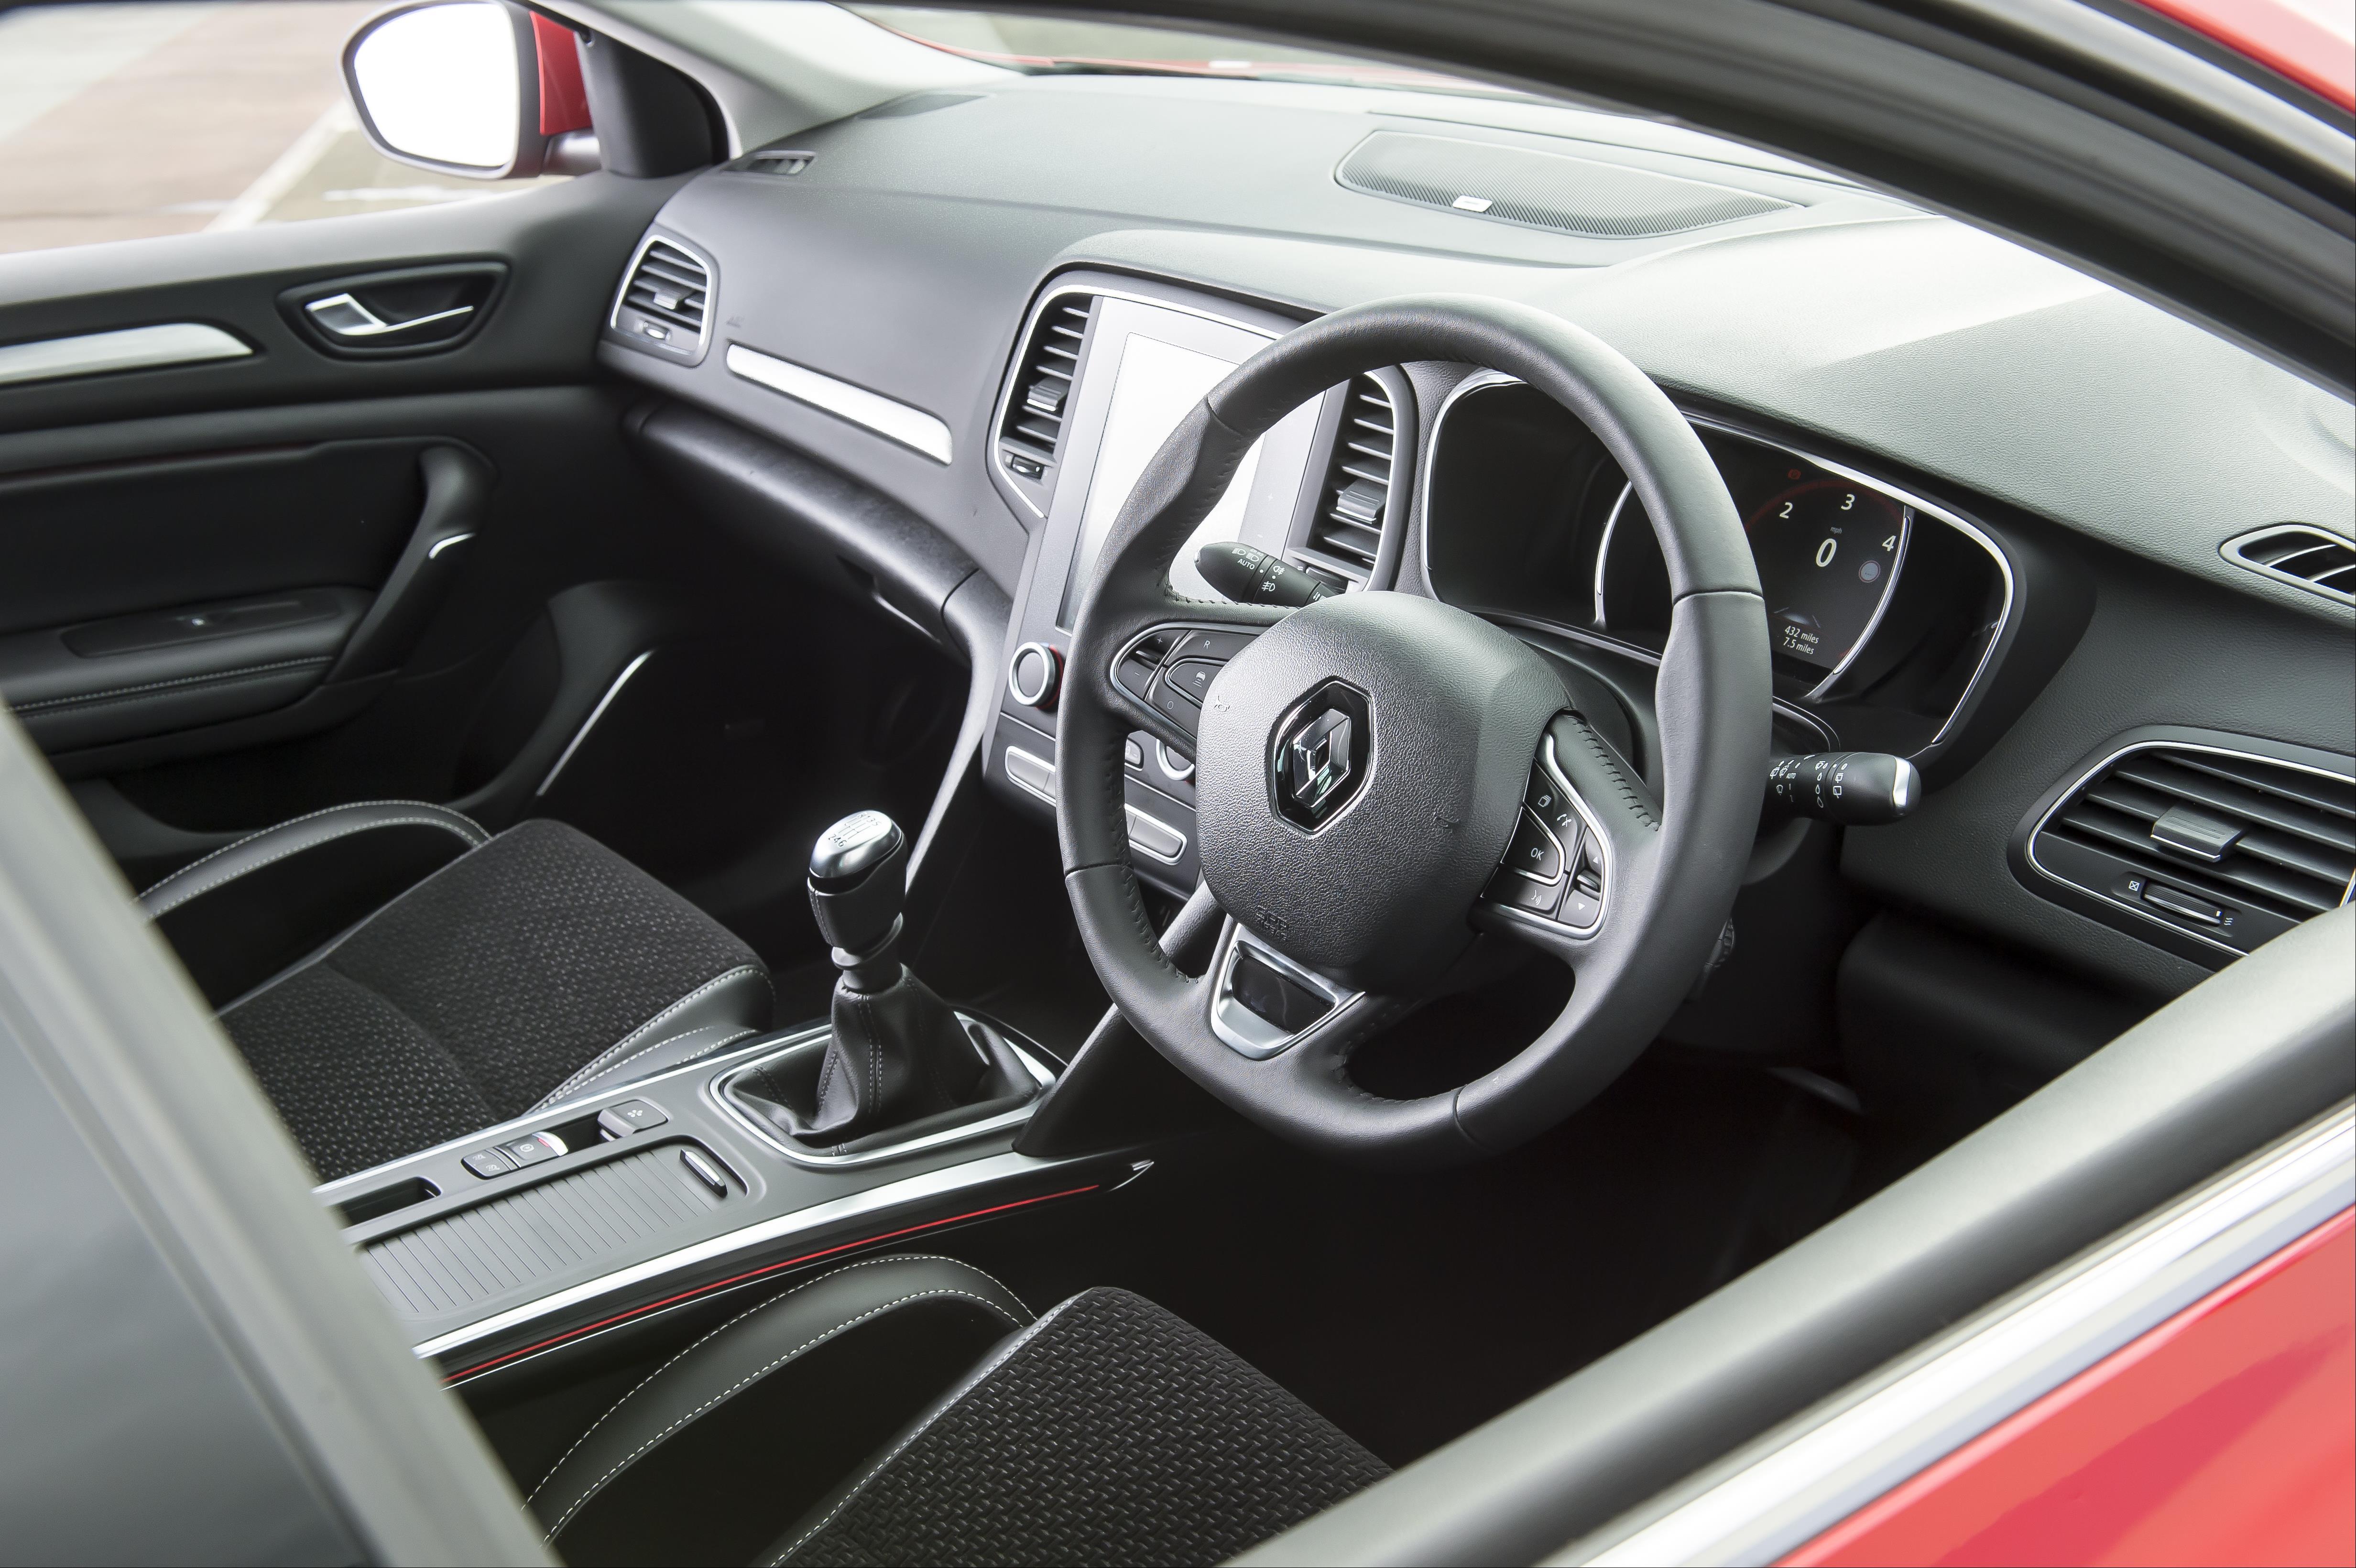 Renault Megane Sport Tourer Steering Wheel